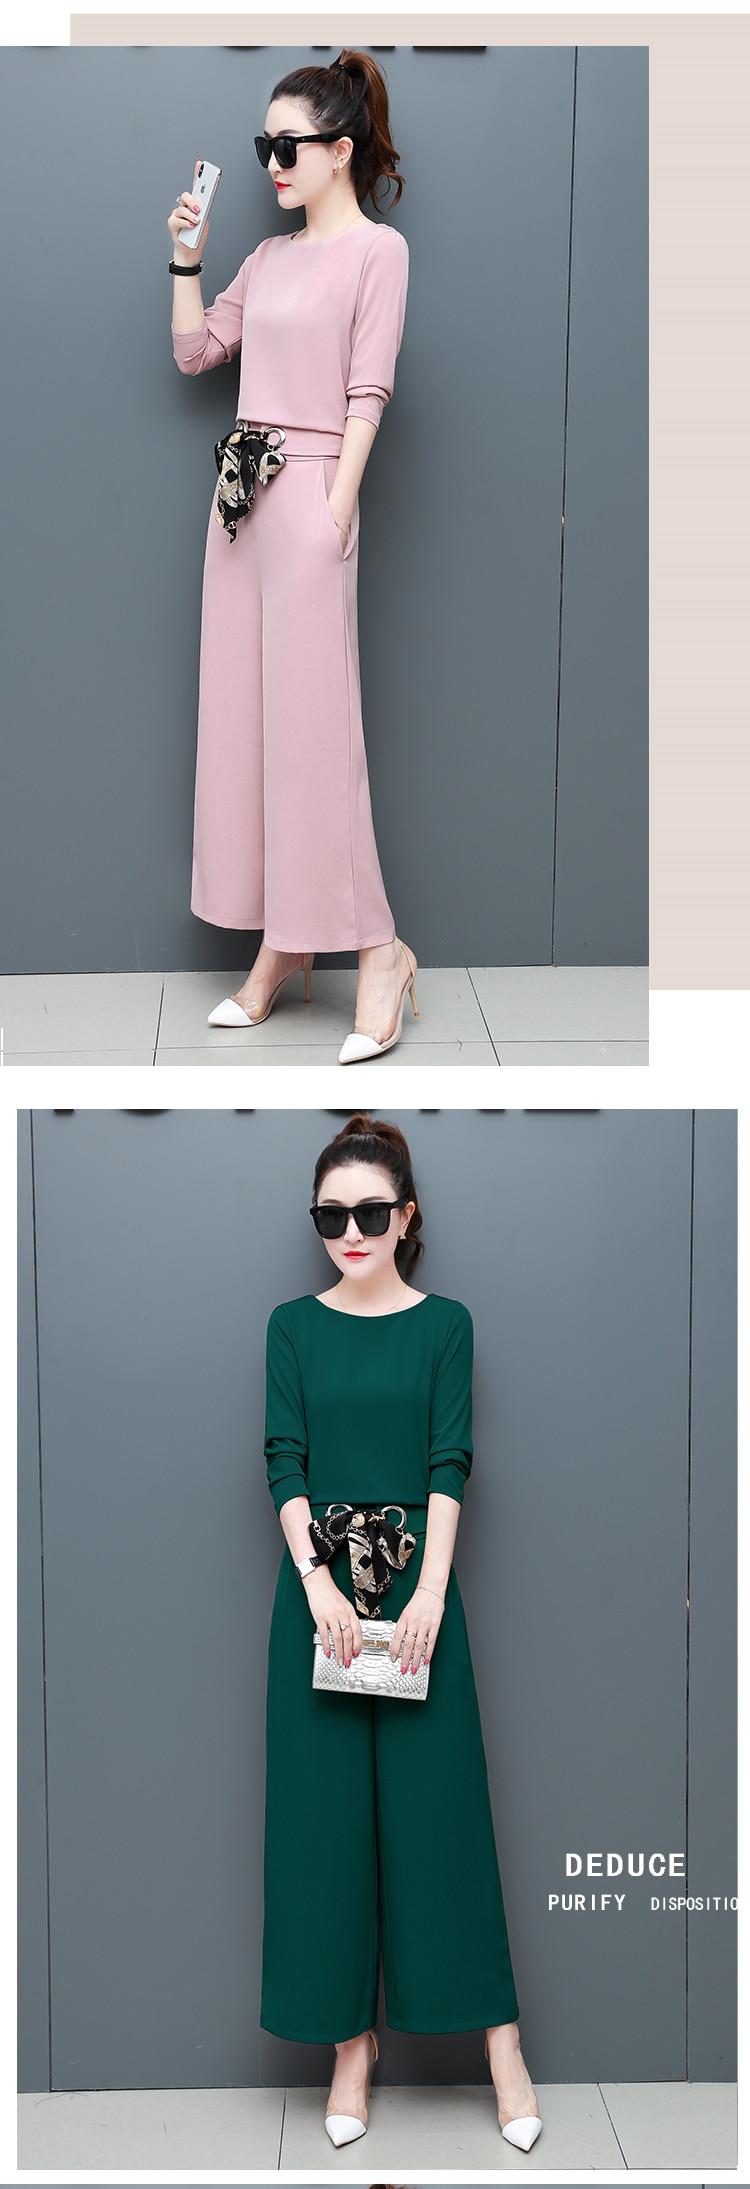 Chiffon 2 Piece Set Women Long Sleeve Tops And Wide Leg Pants Trousers Set Suits Spring Autumn Casual Office Elegant Women's Set 14 Online shopping Bangladesh